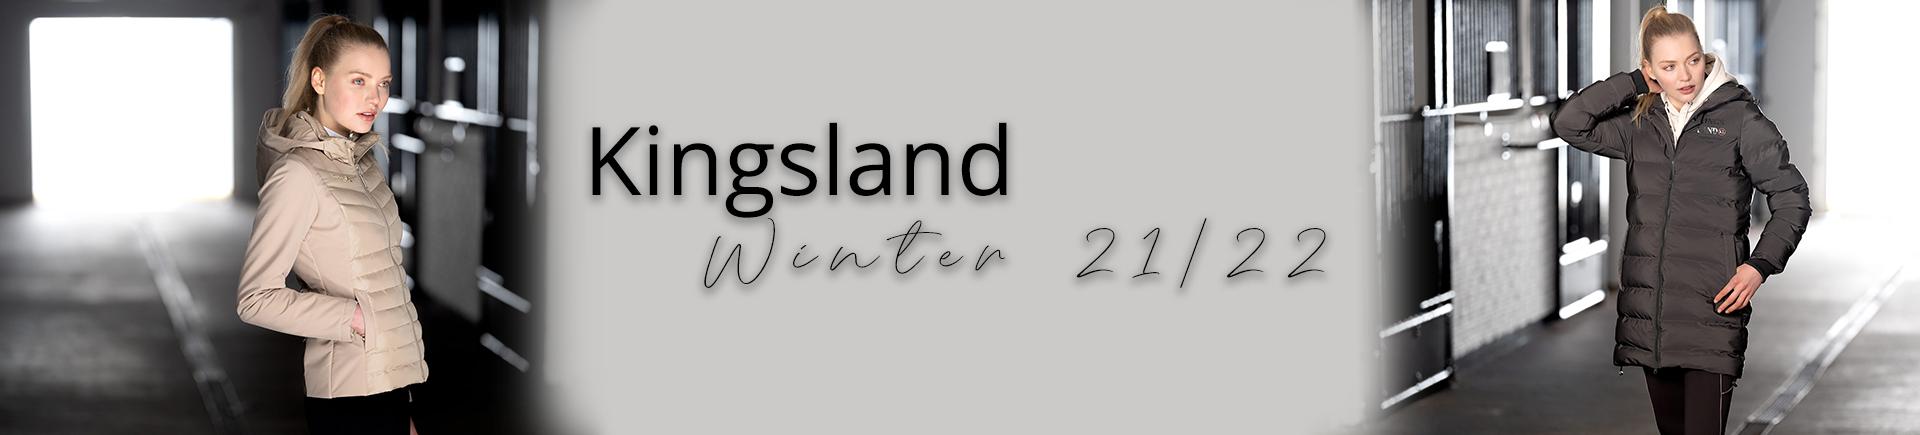 Kingsland 2021 wintercollectie